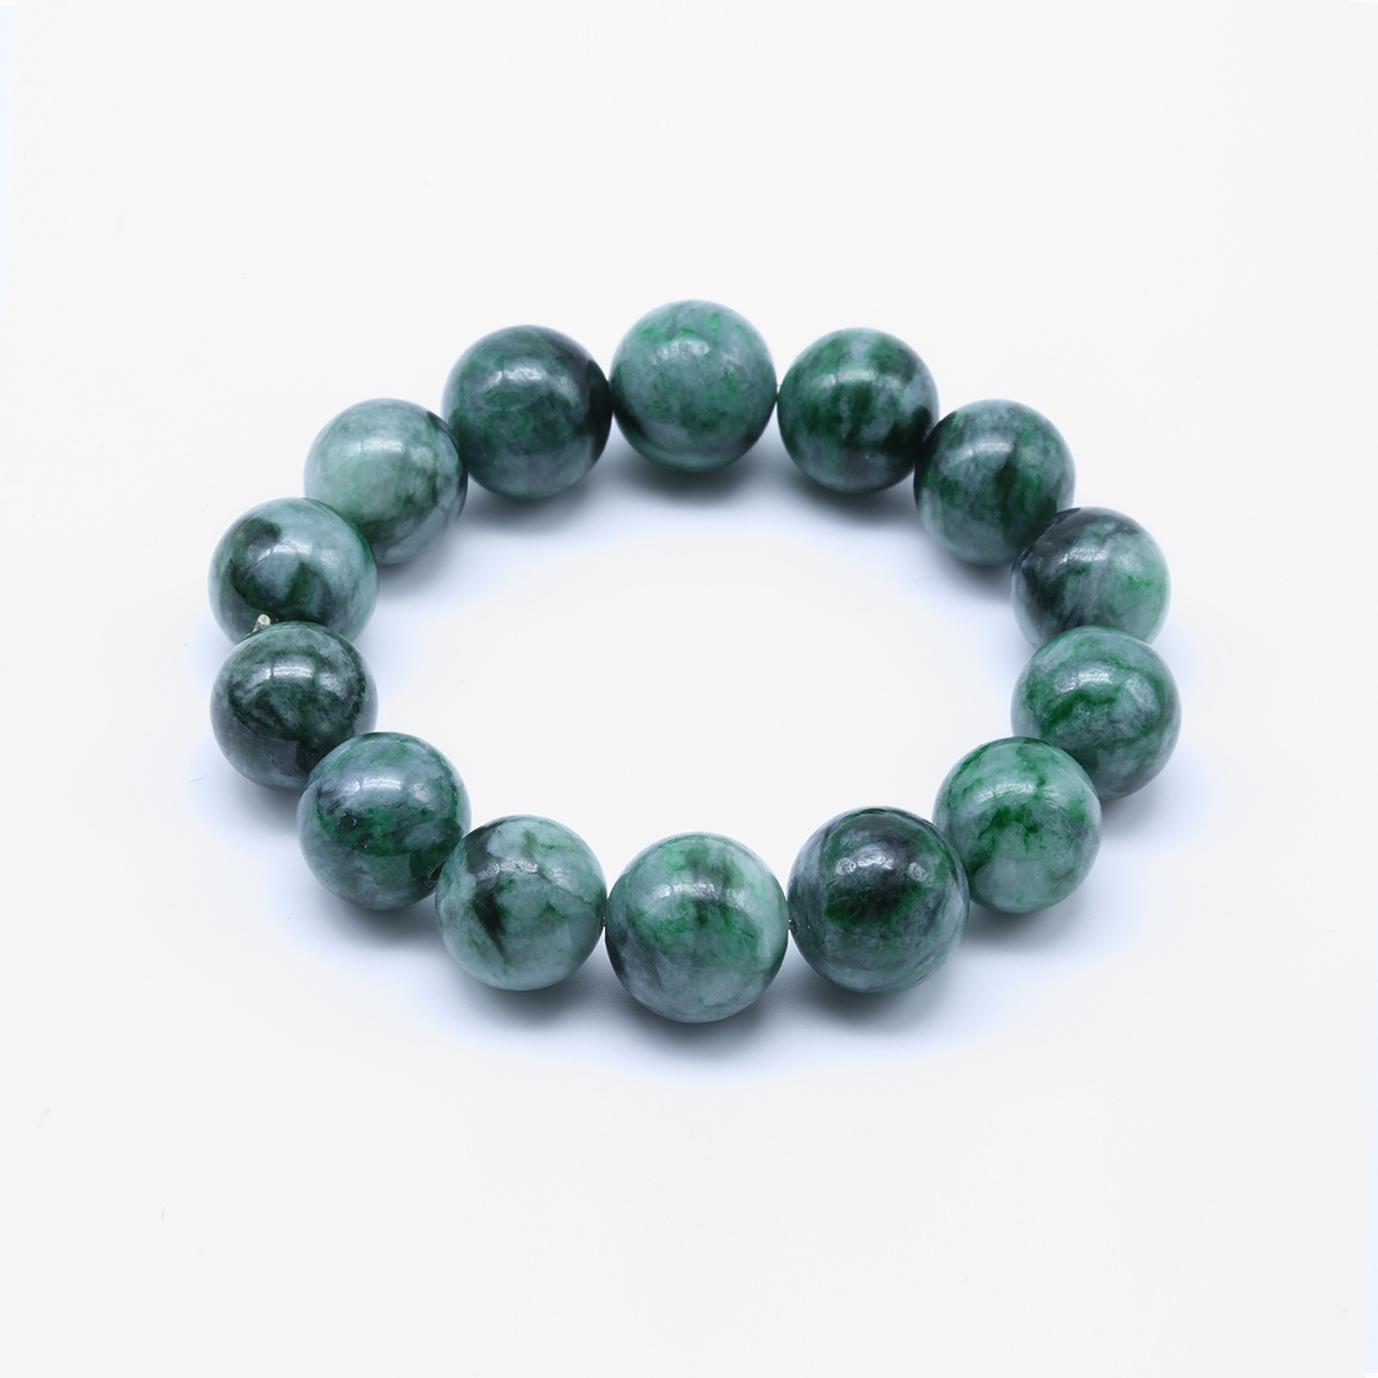 Splashes of Green Jadeite Jade Bead Bracelet